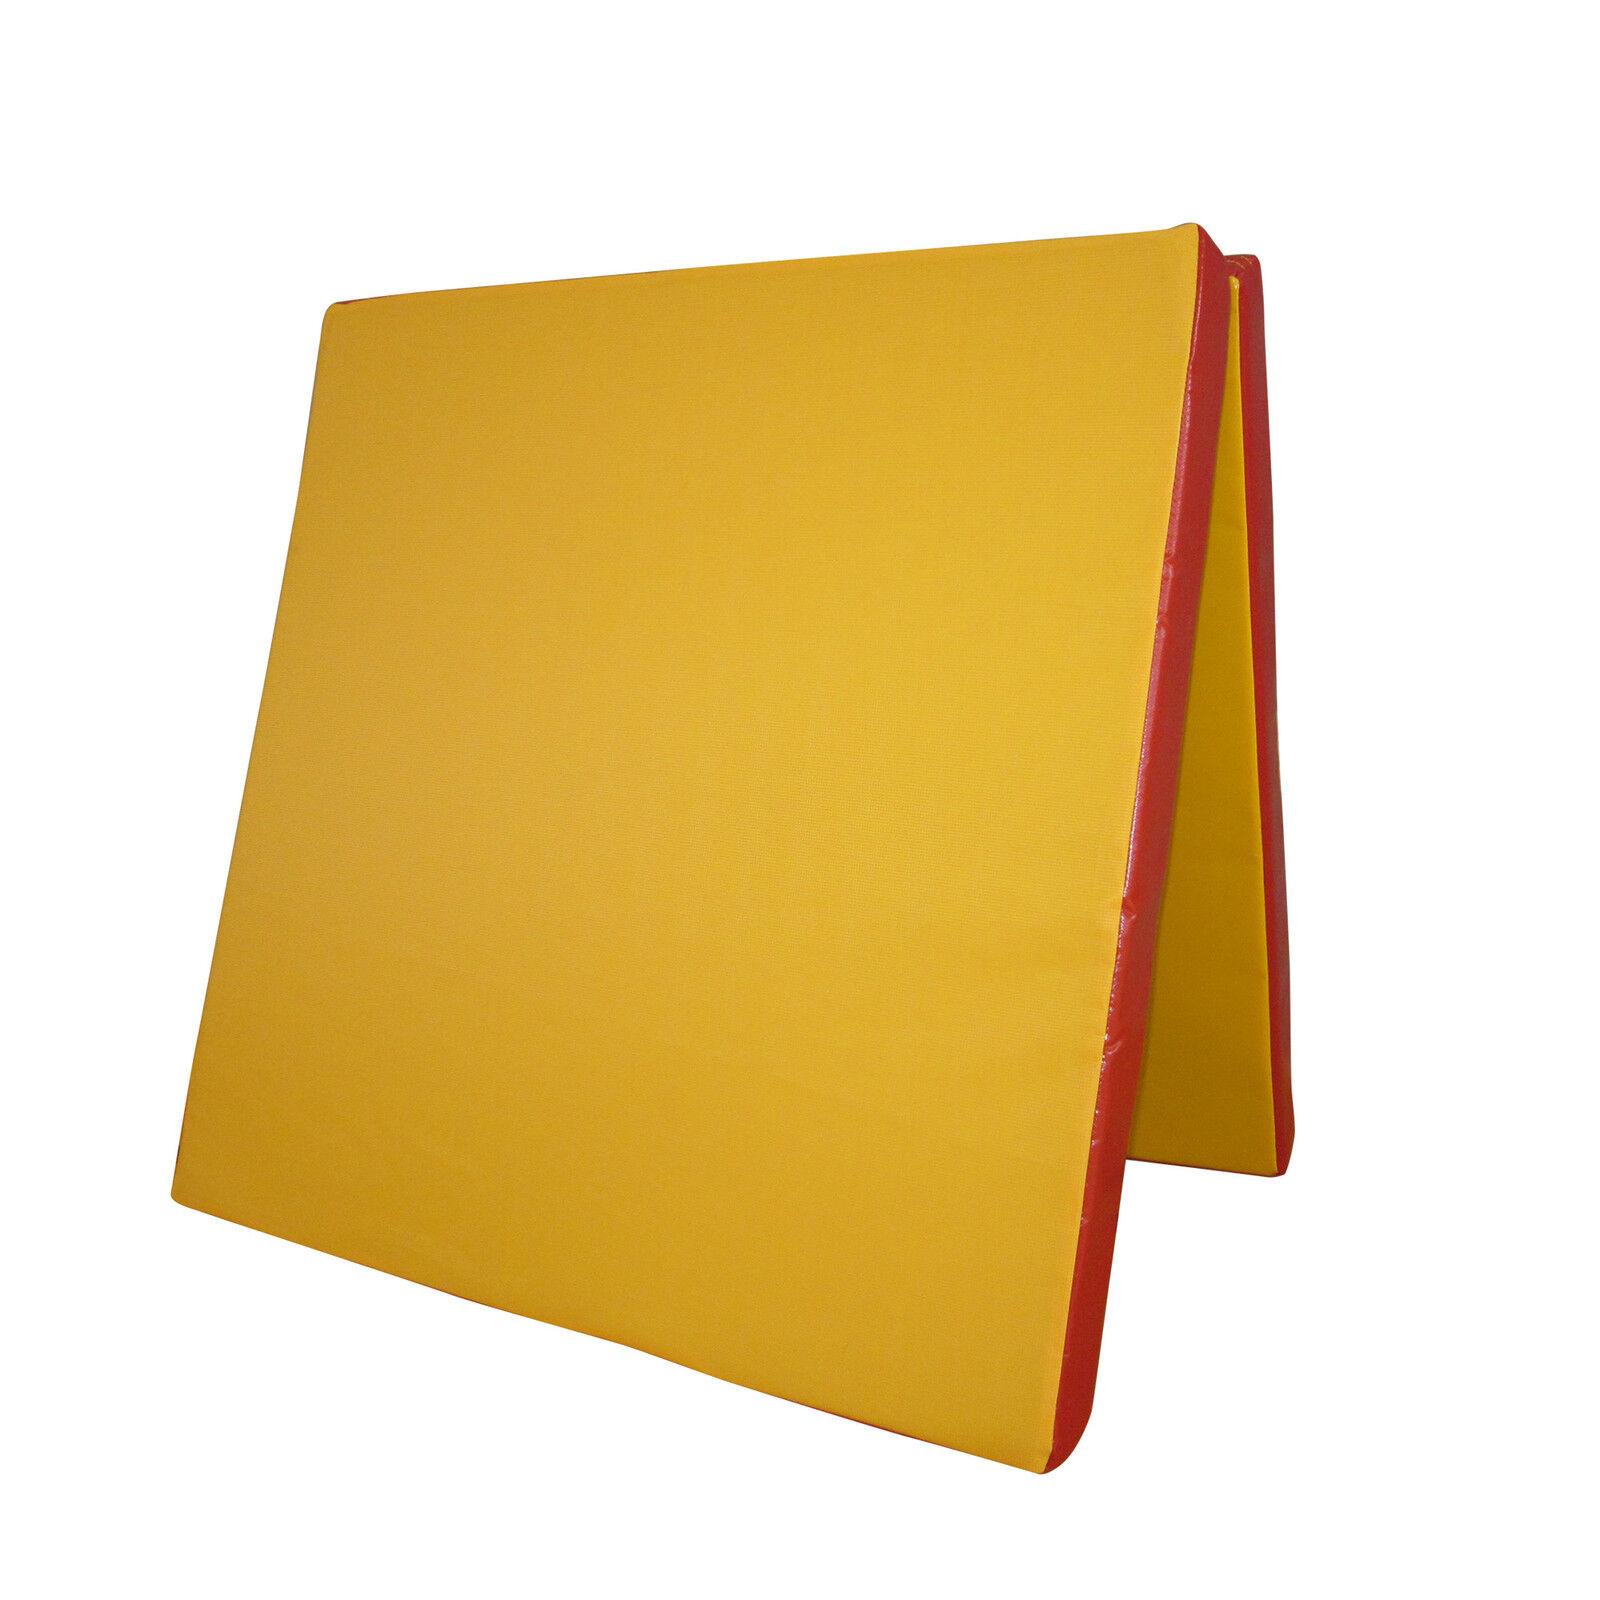 Grevinga® VITAL klappbare Turnmatte GELB - ROT  200 x 100 x 6 cm - RG 22 -138246